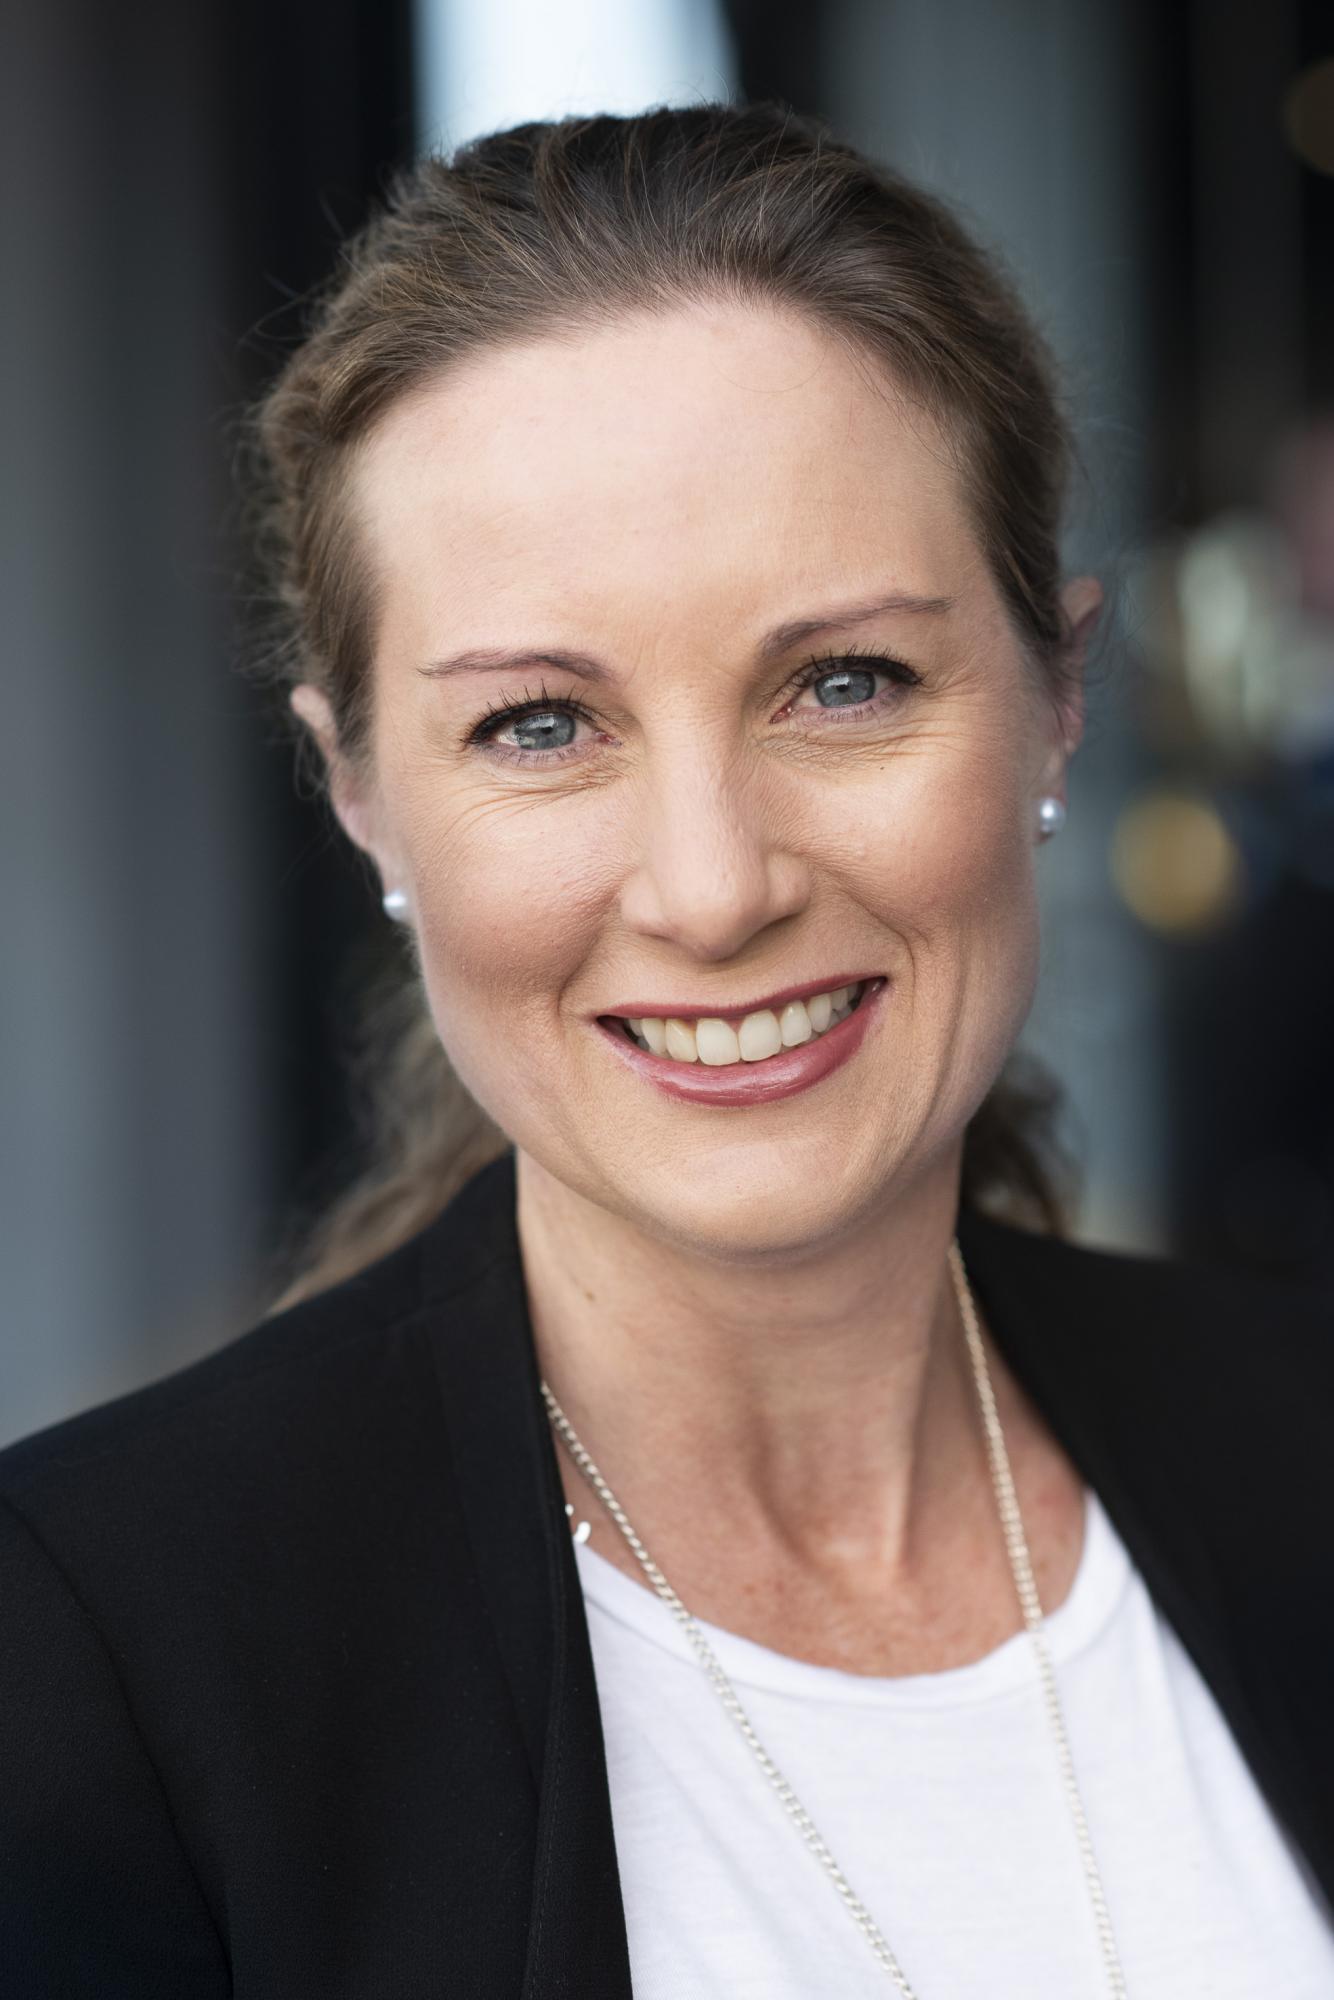 Headshot of Alexandra Garrott